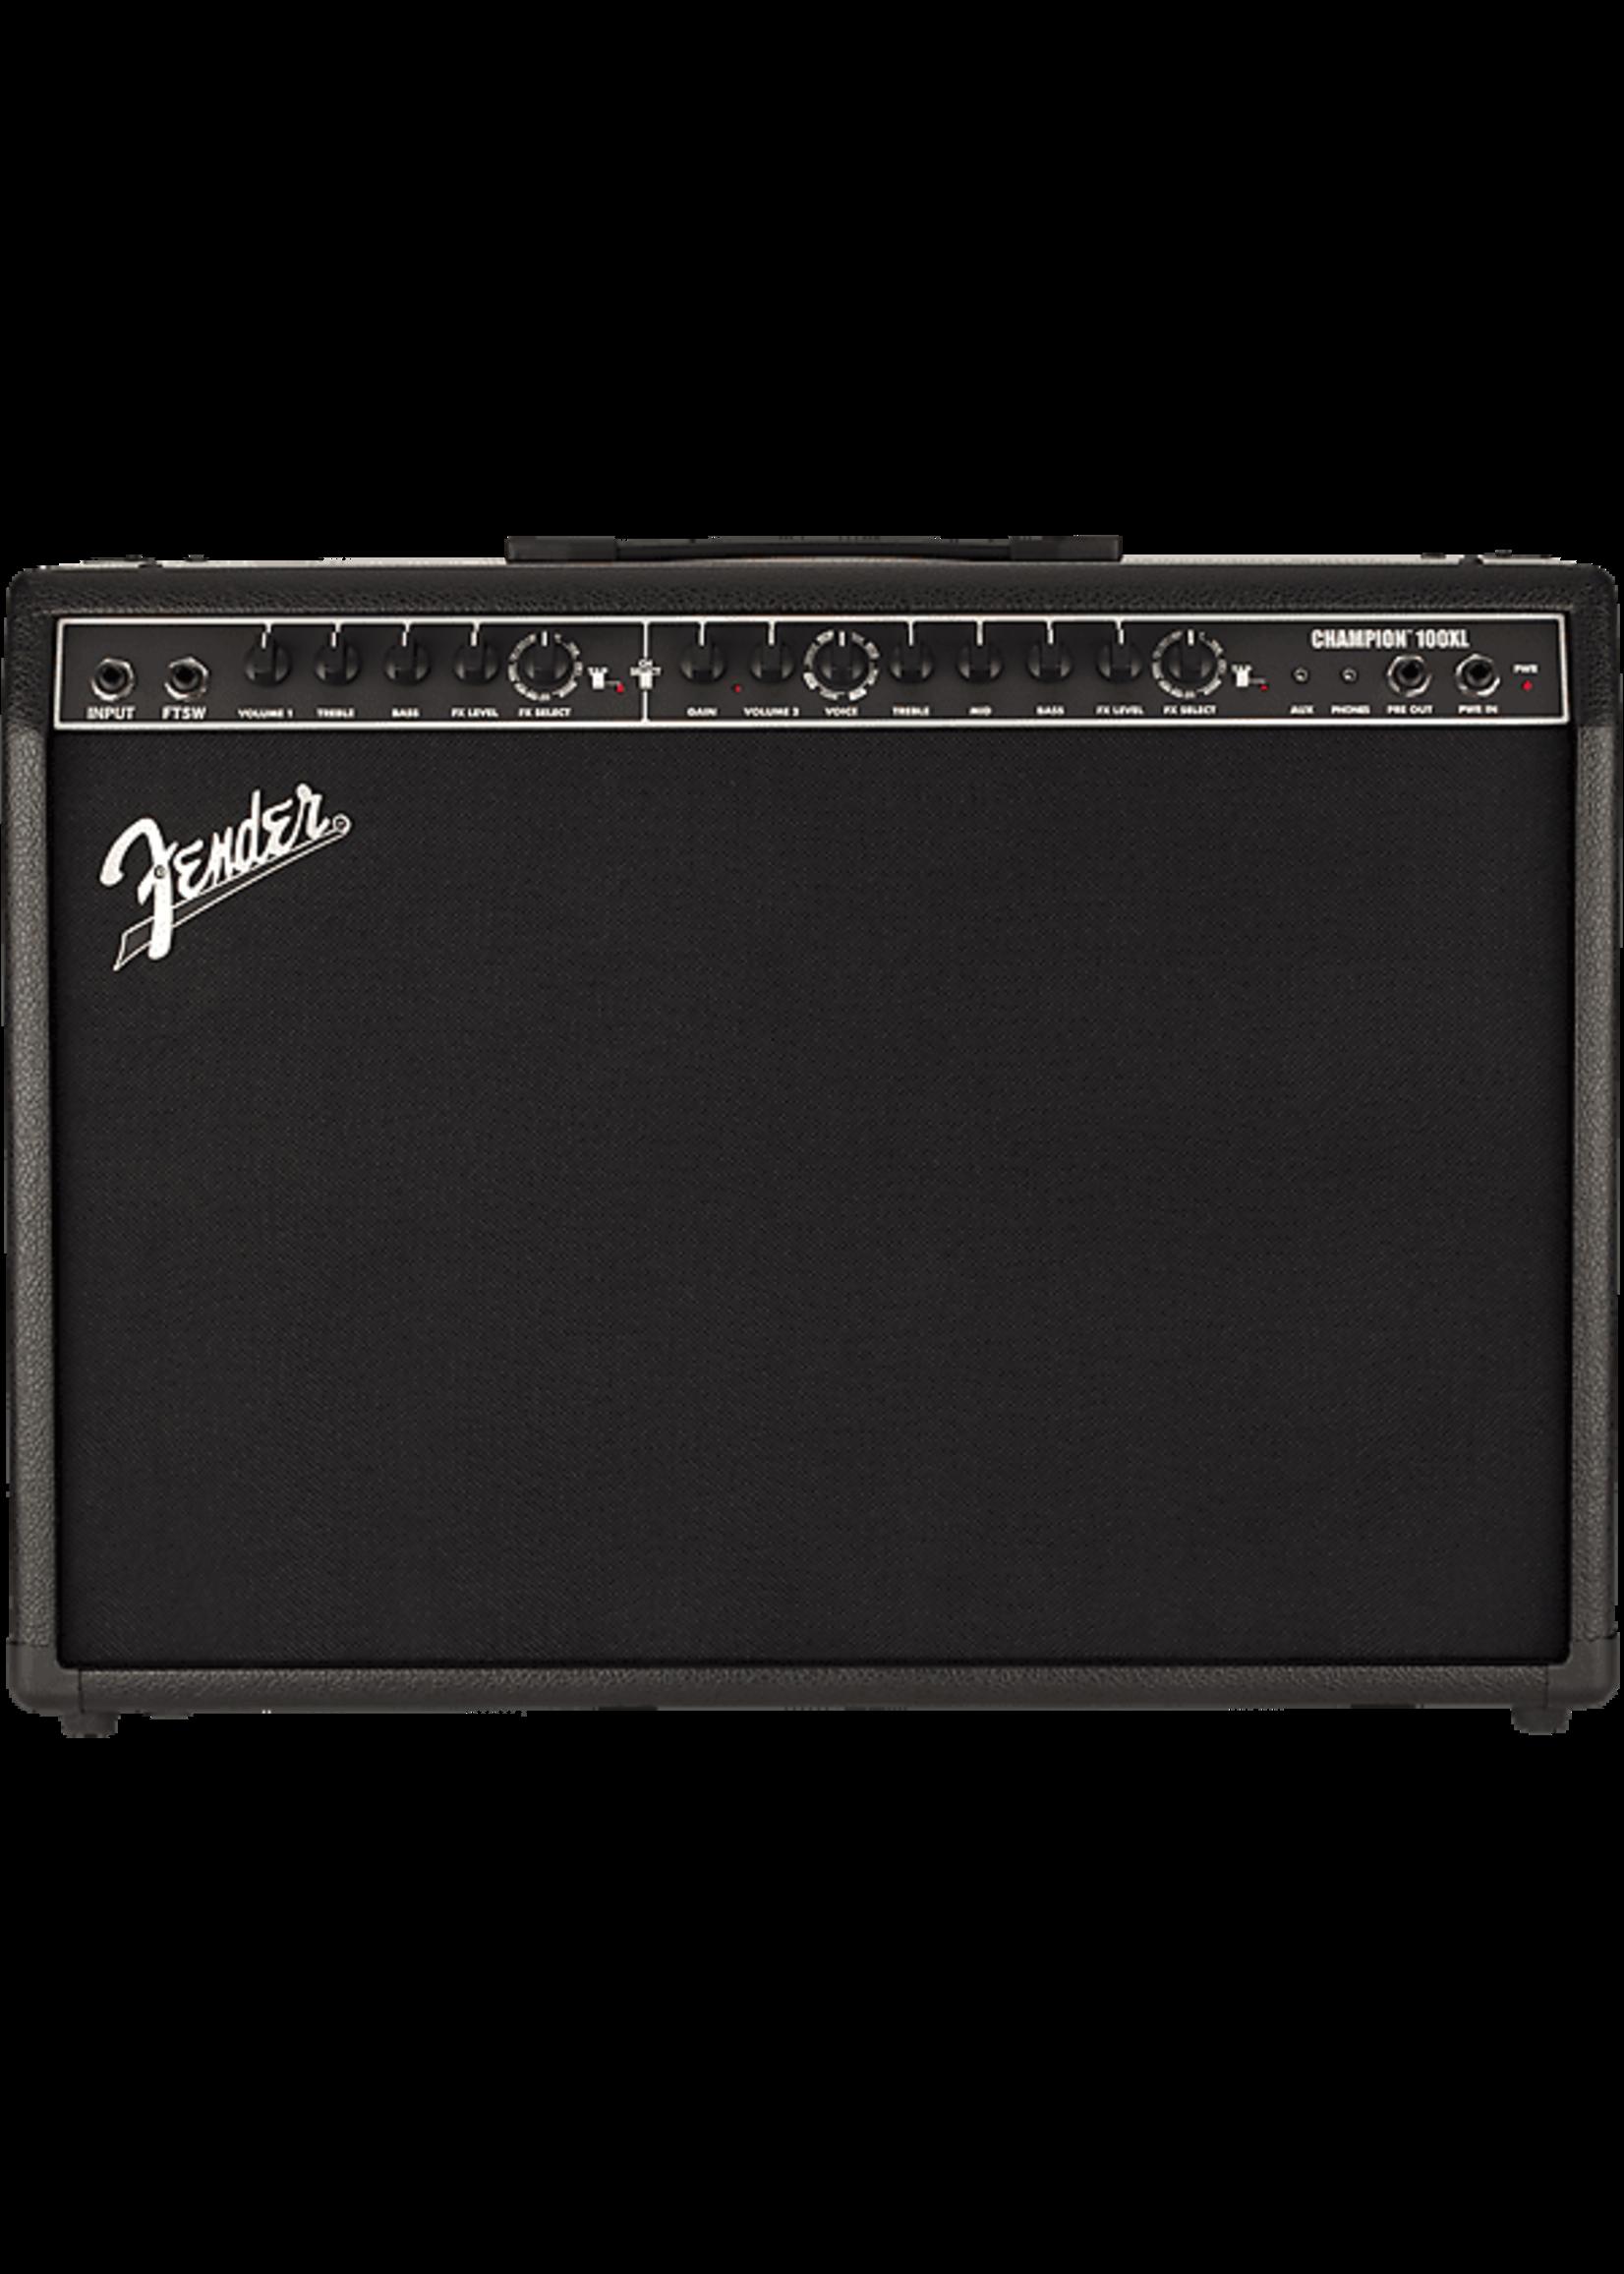 Fender Fender Champion 100XL Electric Guitar Amplifier